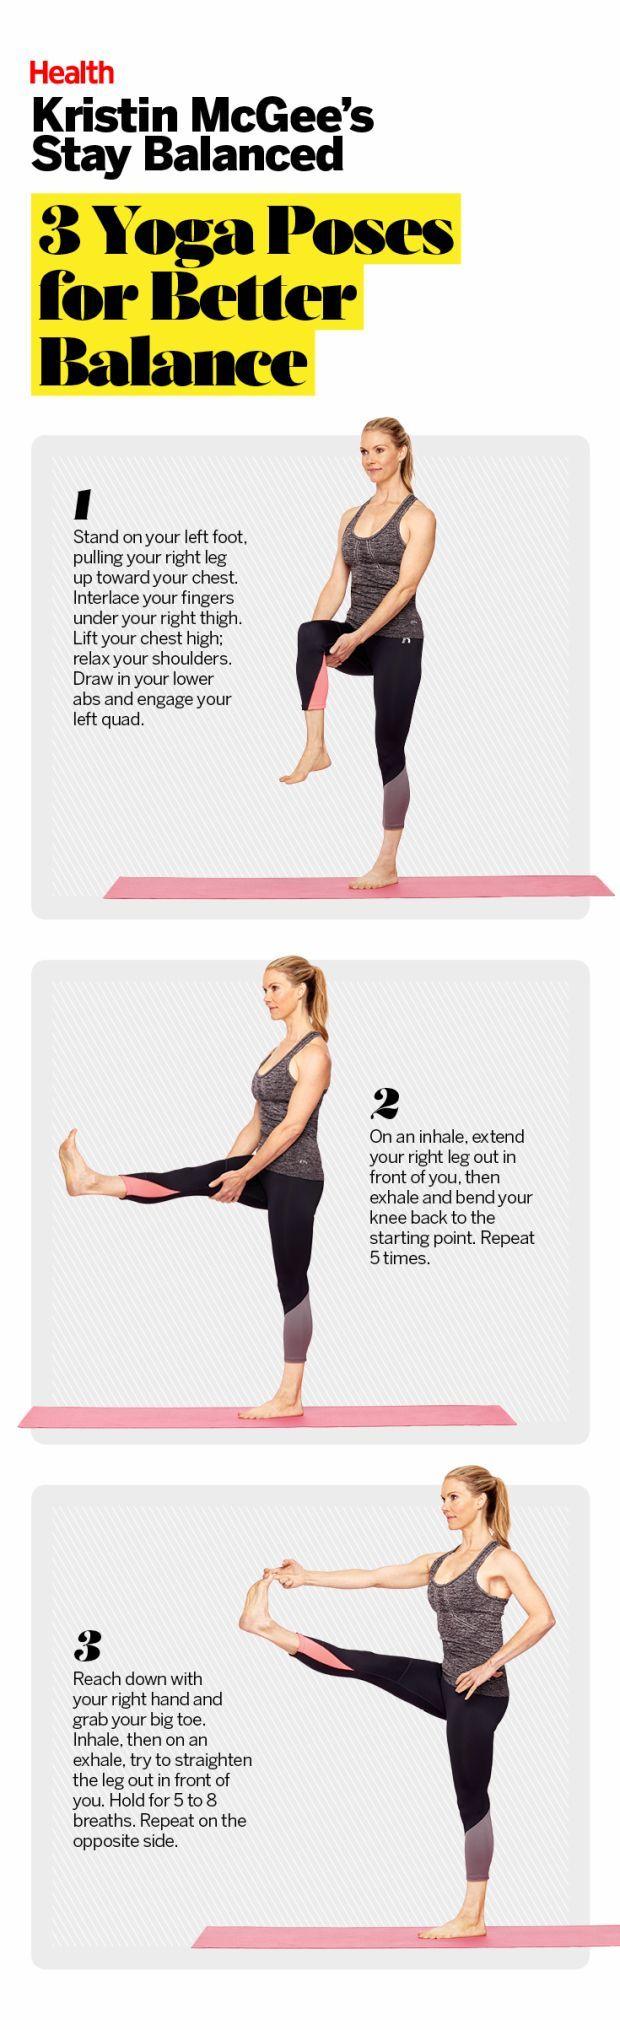 3 Yoga Poses For Better Balance Yoga Poses Yoga Benefits Yoga For Beginners